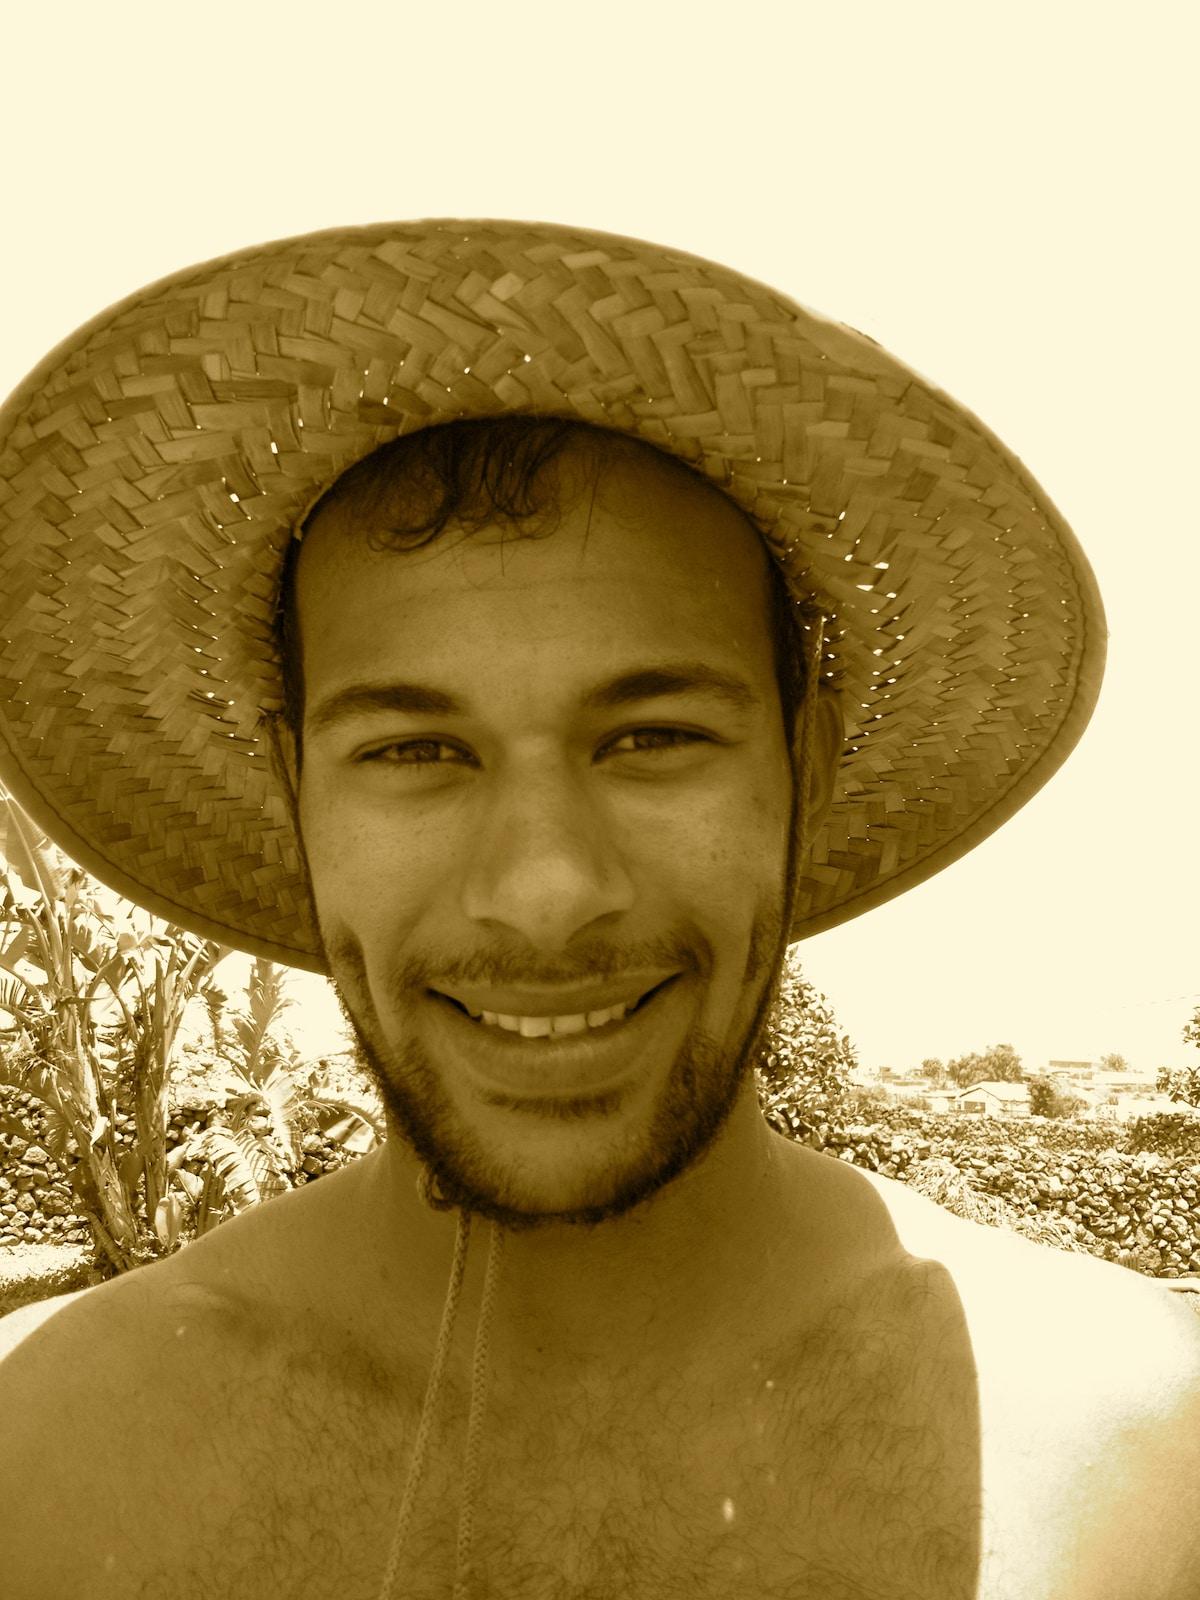 Jonathan from La Oliva